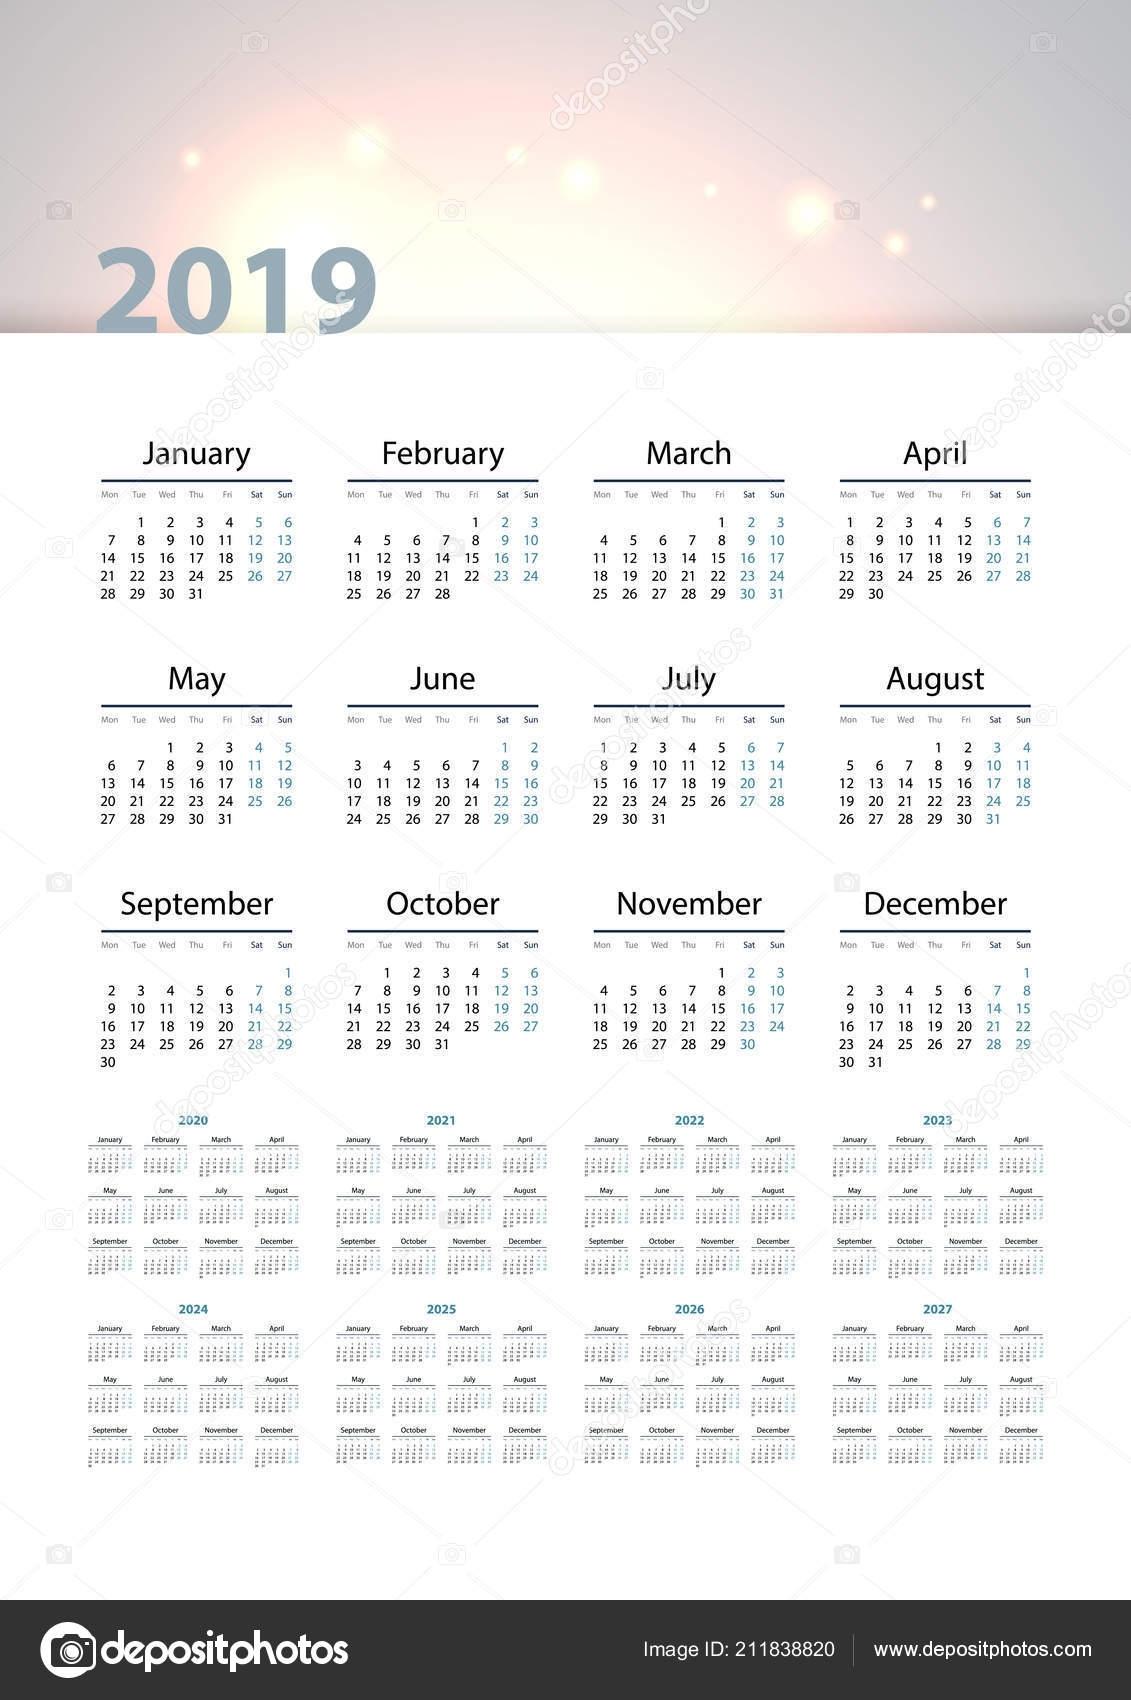 Calendar 2019 2020 2021 2022 2023 2024 2025 2026 2027 — Stock Vector © Tashechka #211838820